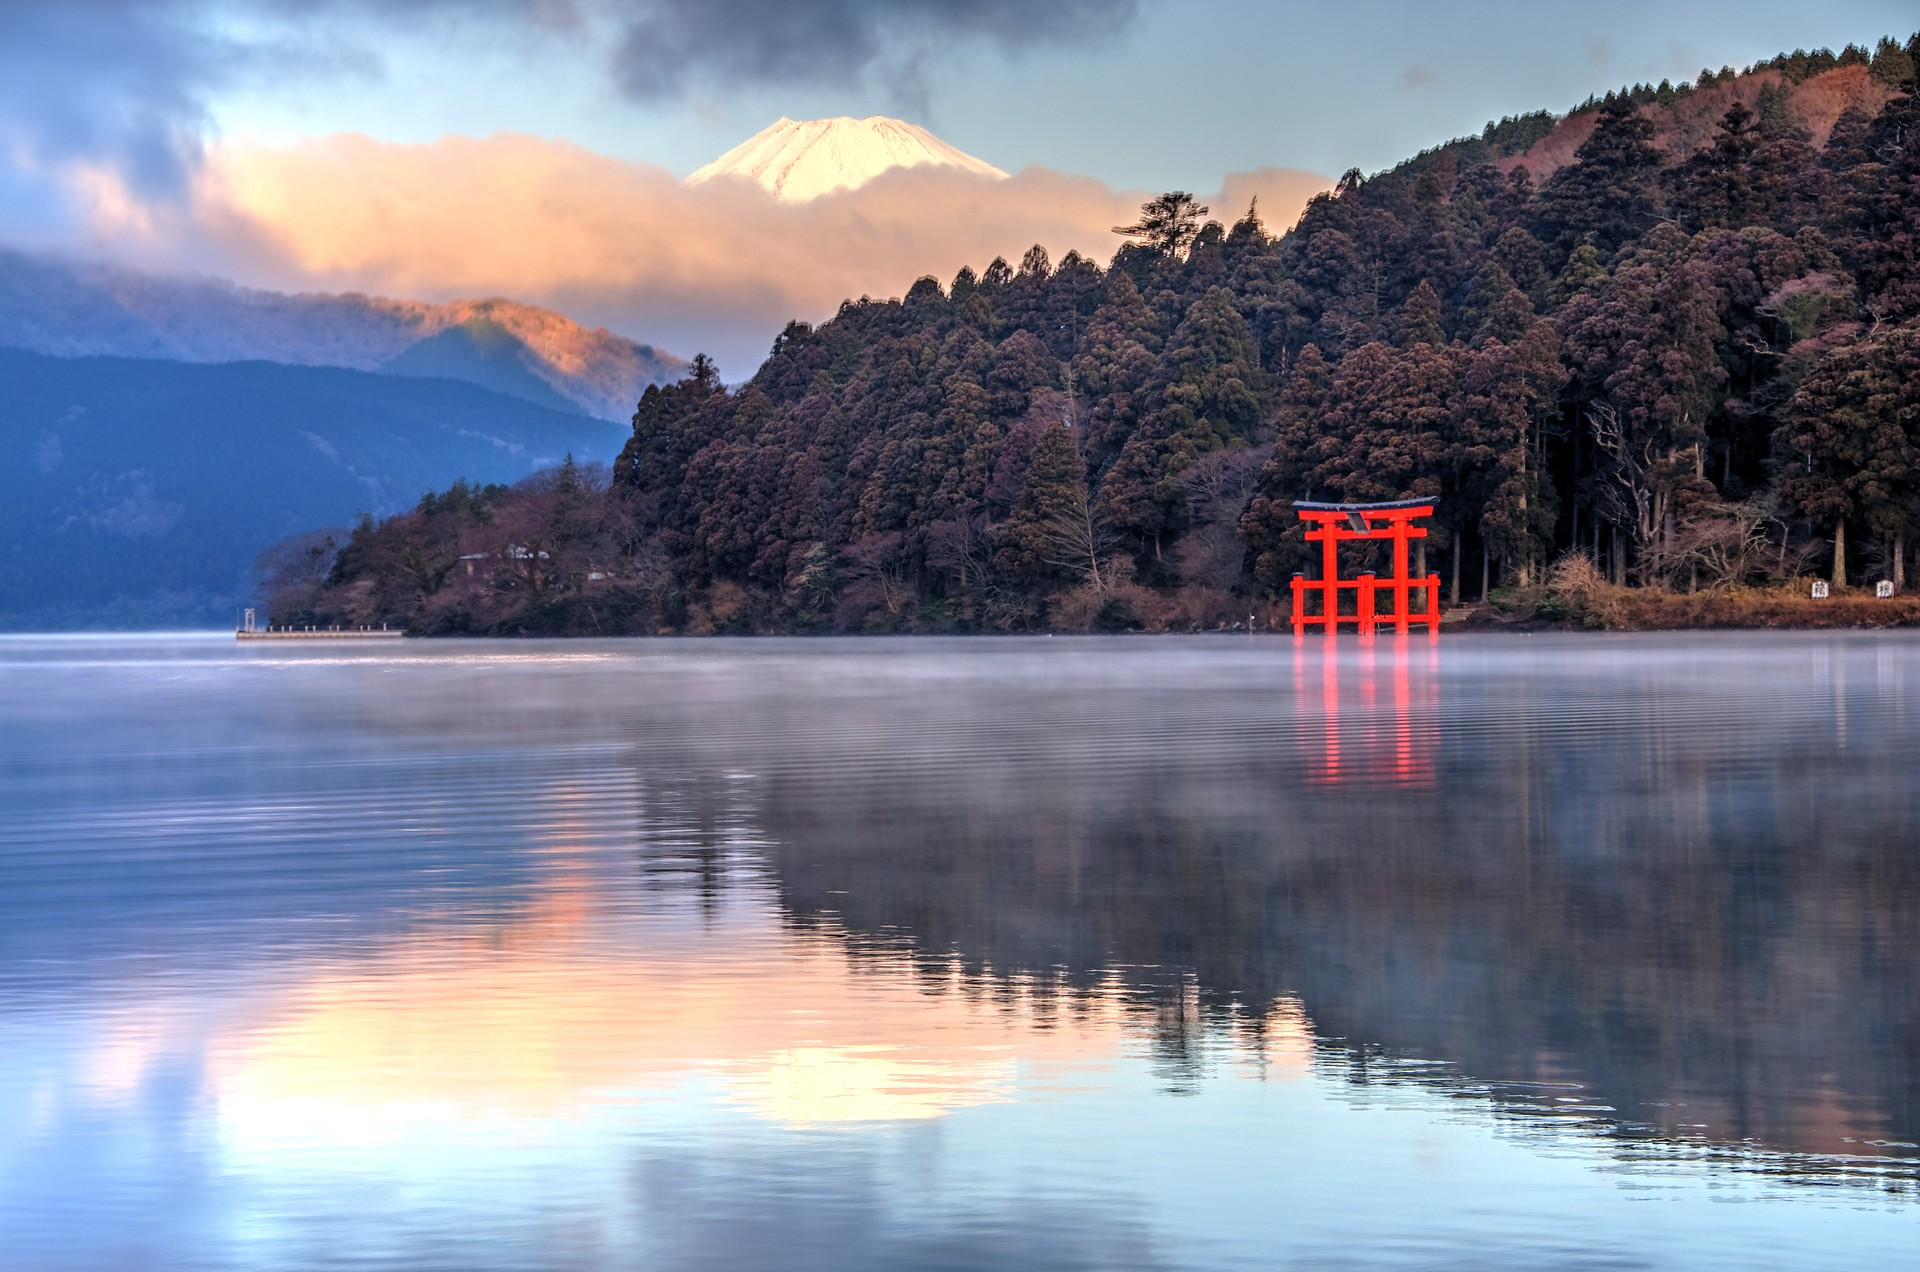 Mount Fuji from across the lake in Hakone, Japan